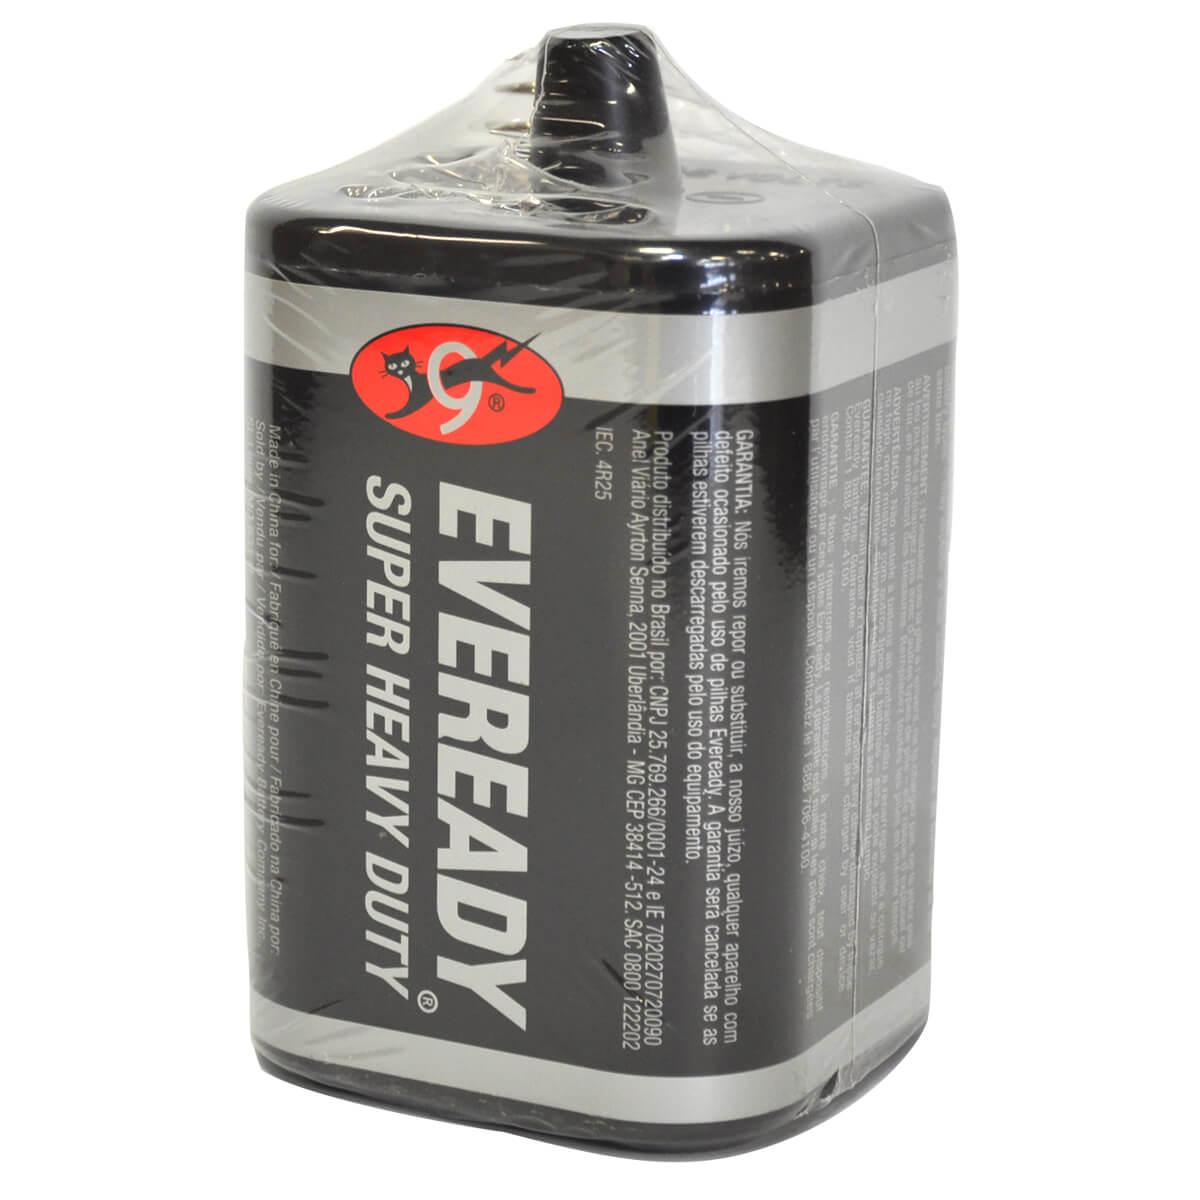 Lantern Battery  - 1209